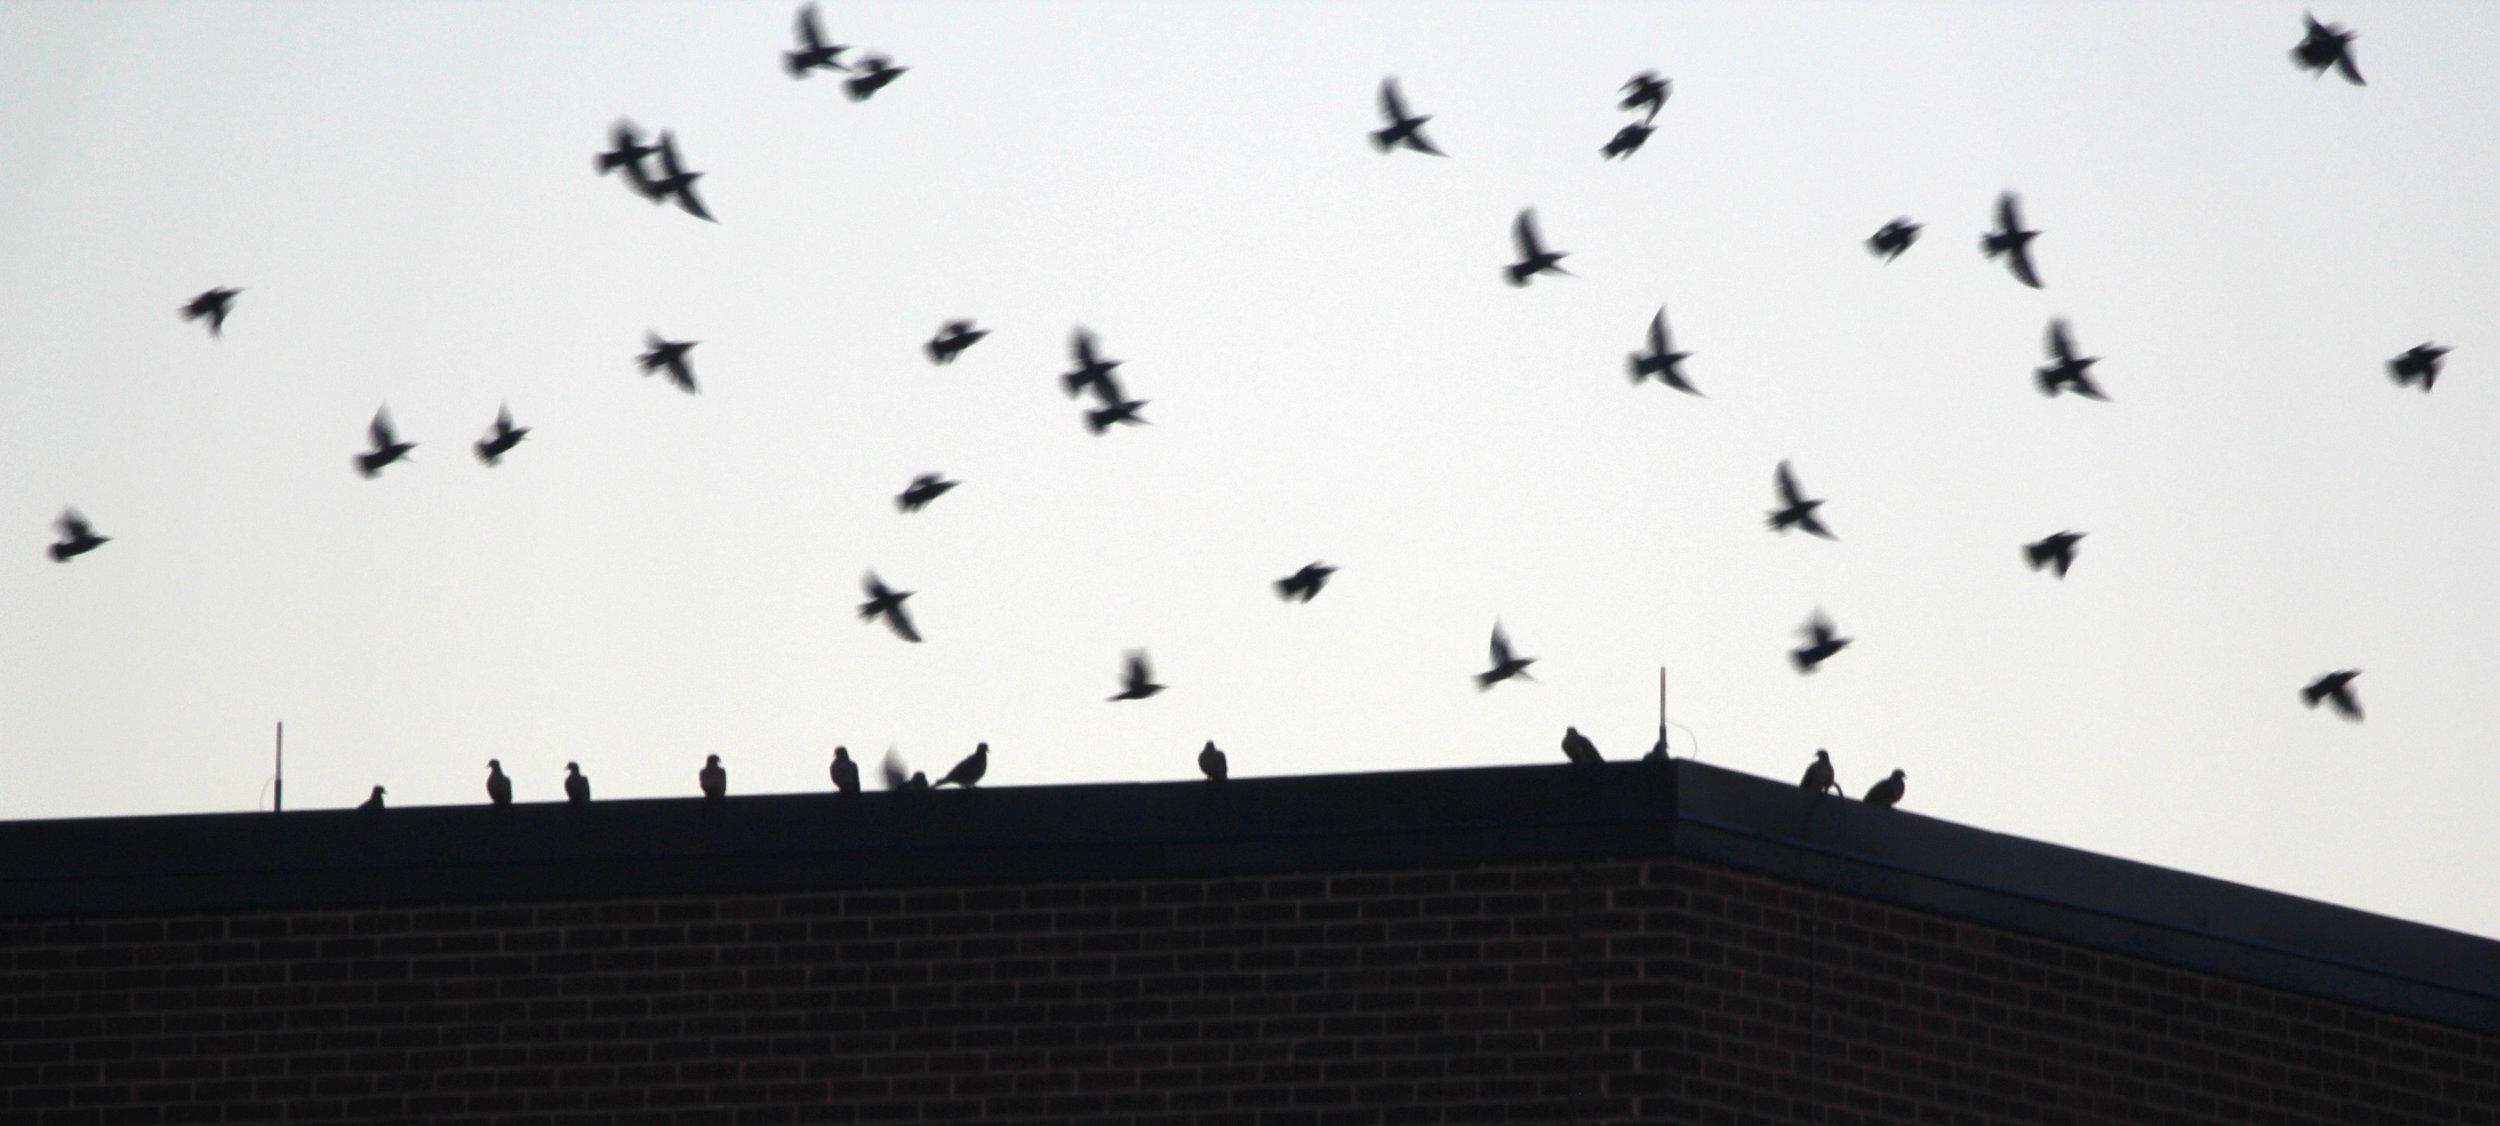 Birds Take Flight, Pittsburgh 2018